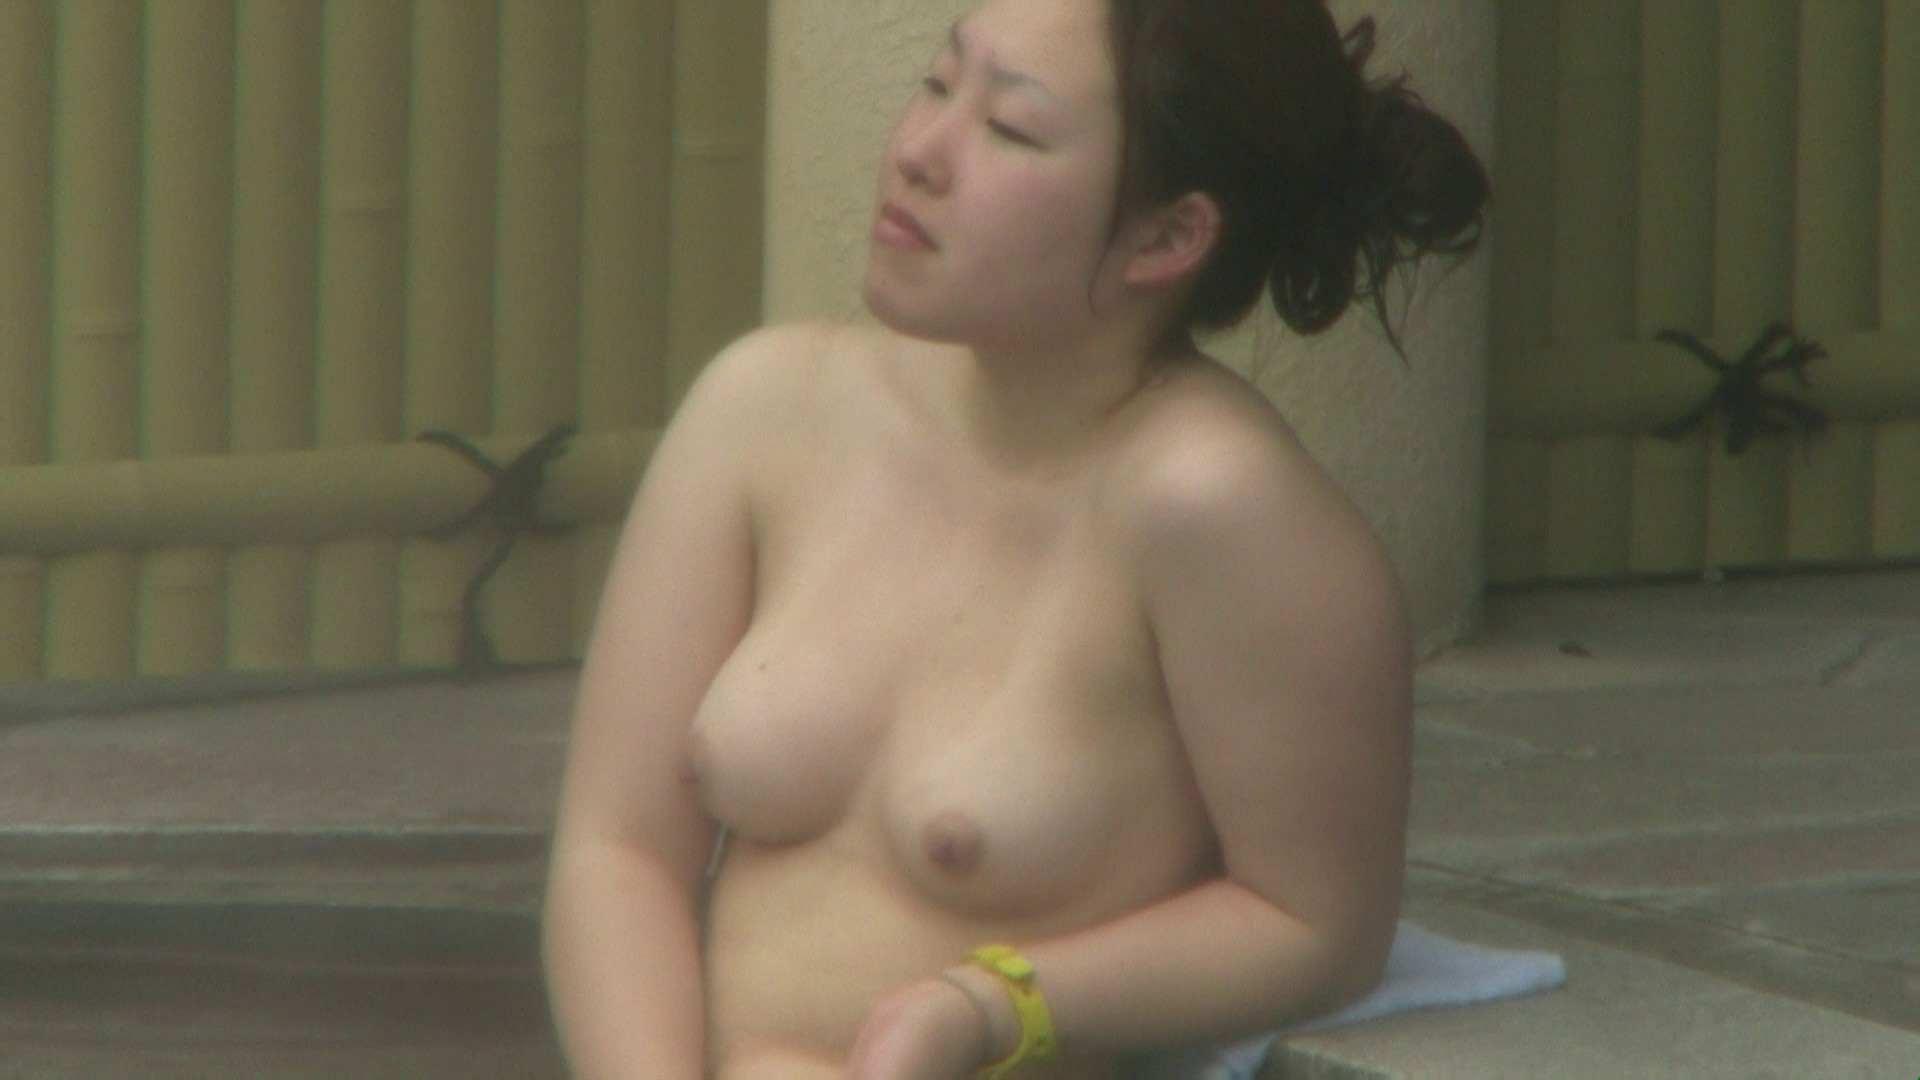 Aquaな露天風呂Vol.72【VIP限定】 0  47連発 46